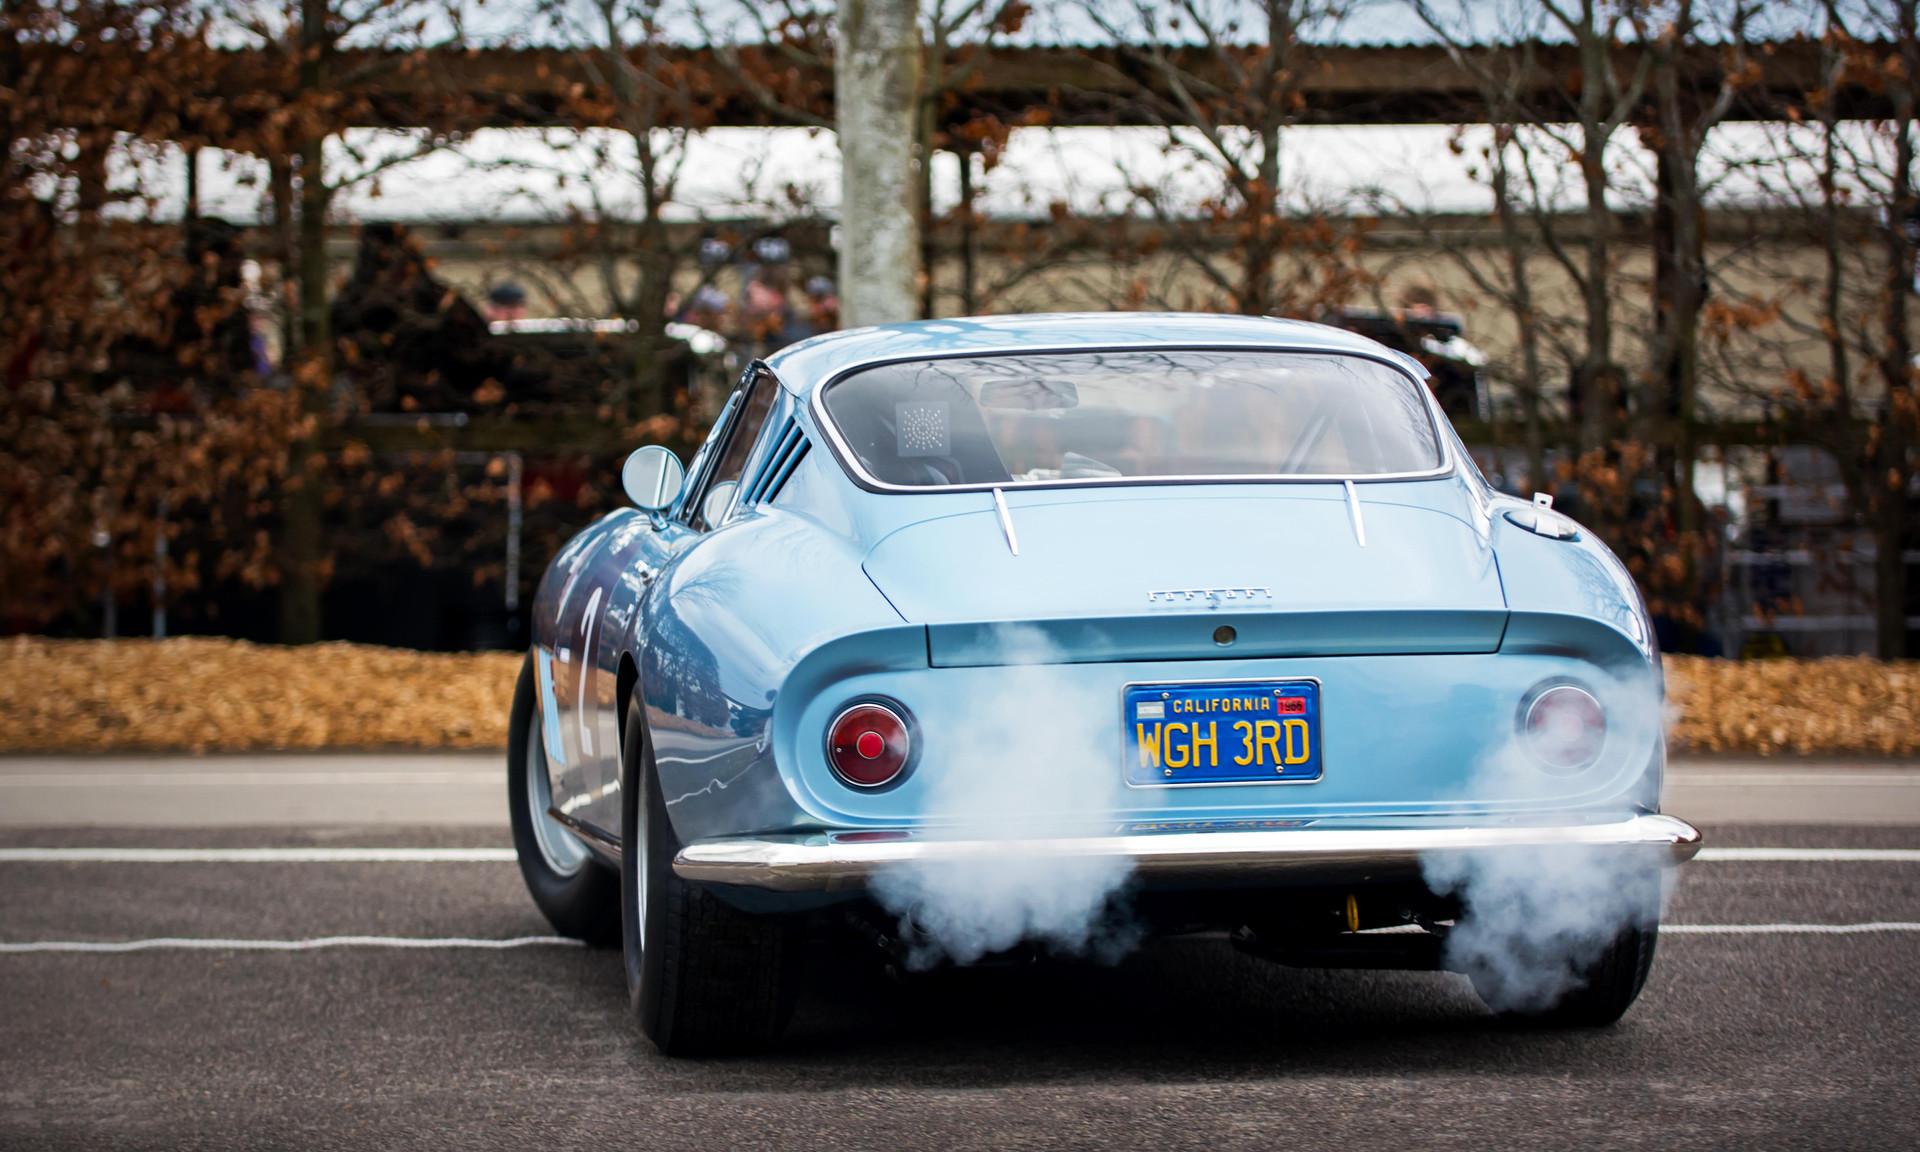 Vincent Gaye's 1966 Ferrari 275 GTB Competizione at the Goodwood 76MM